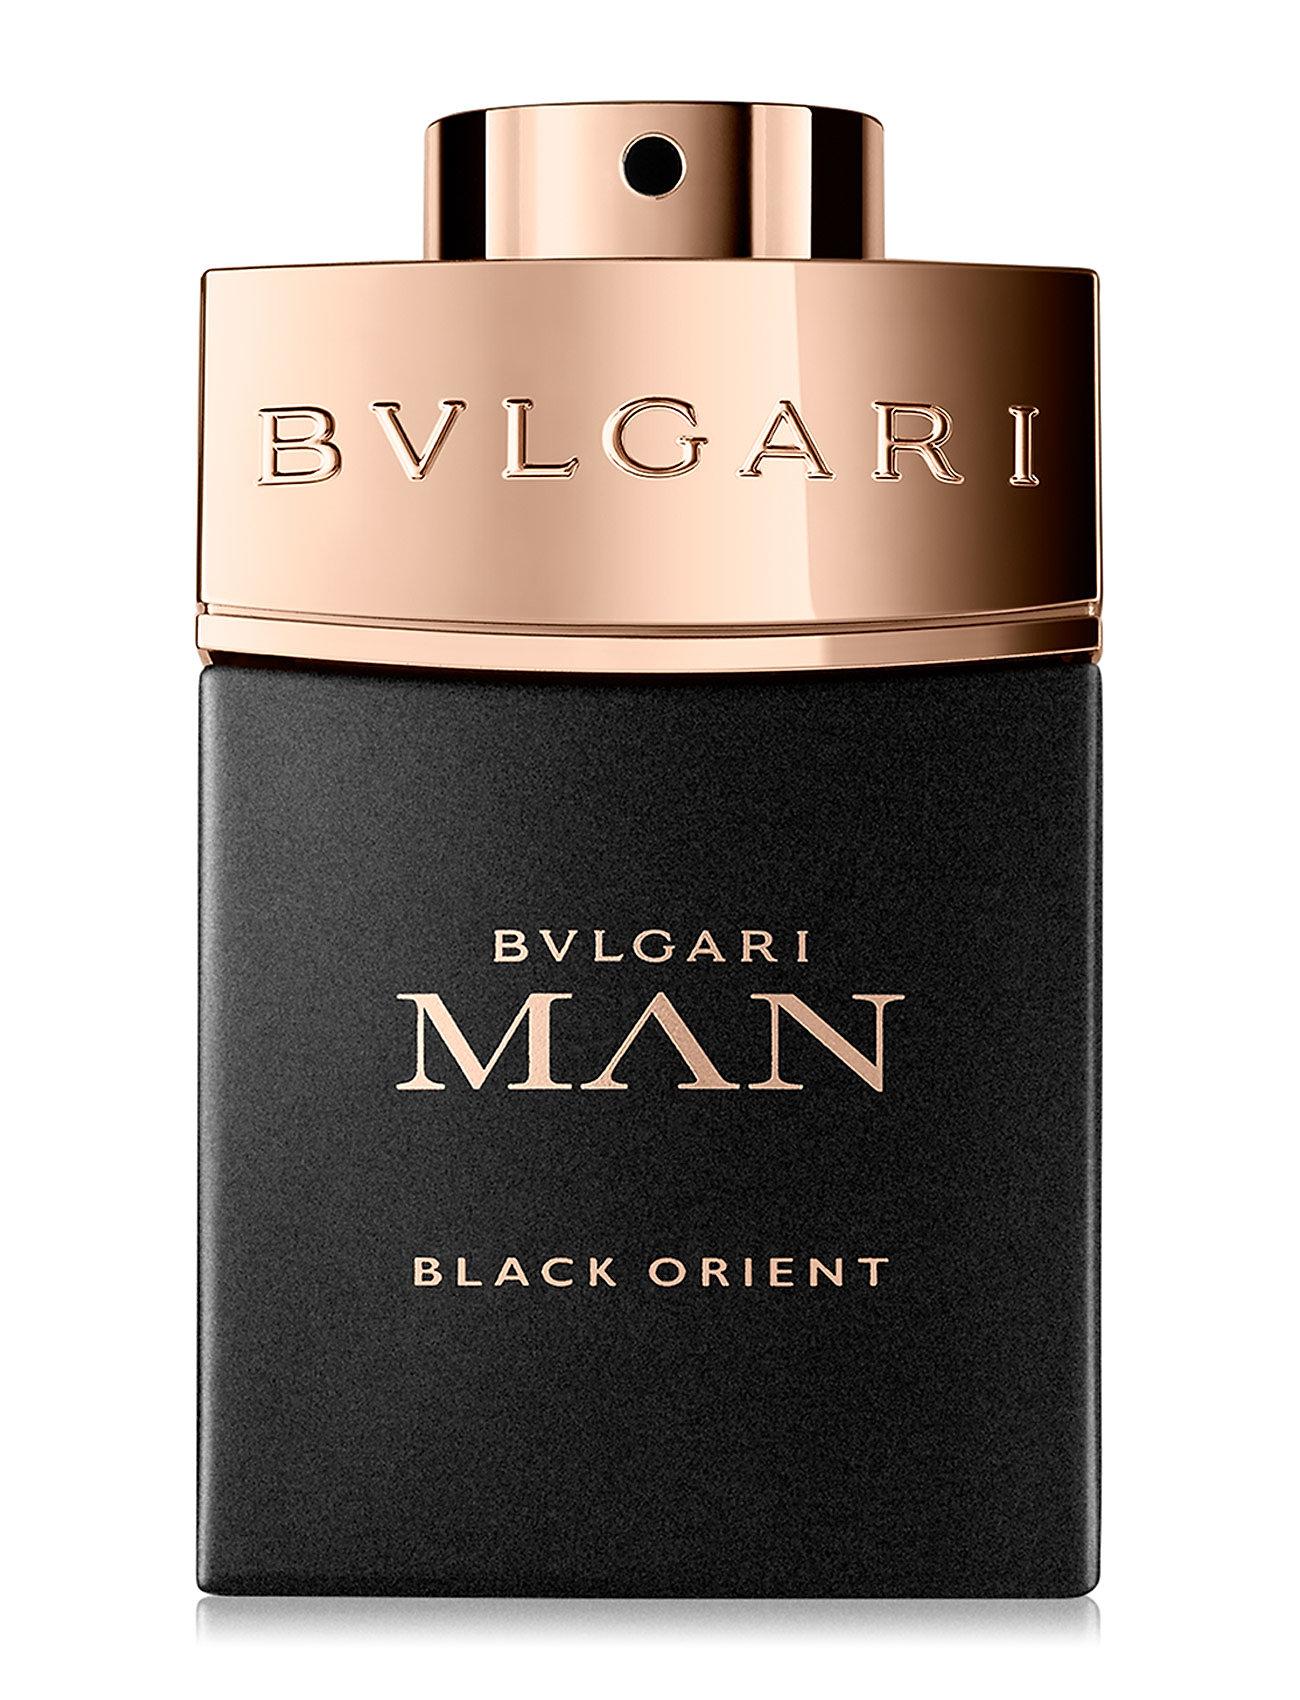 bvlgari – Man black orient edp 60ml fra boozt.com dk